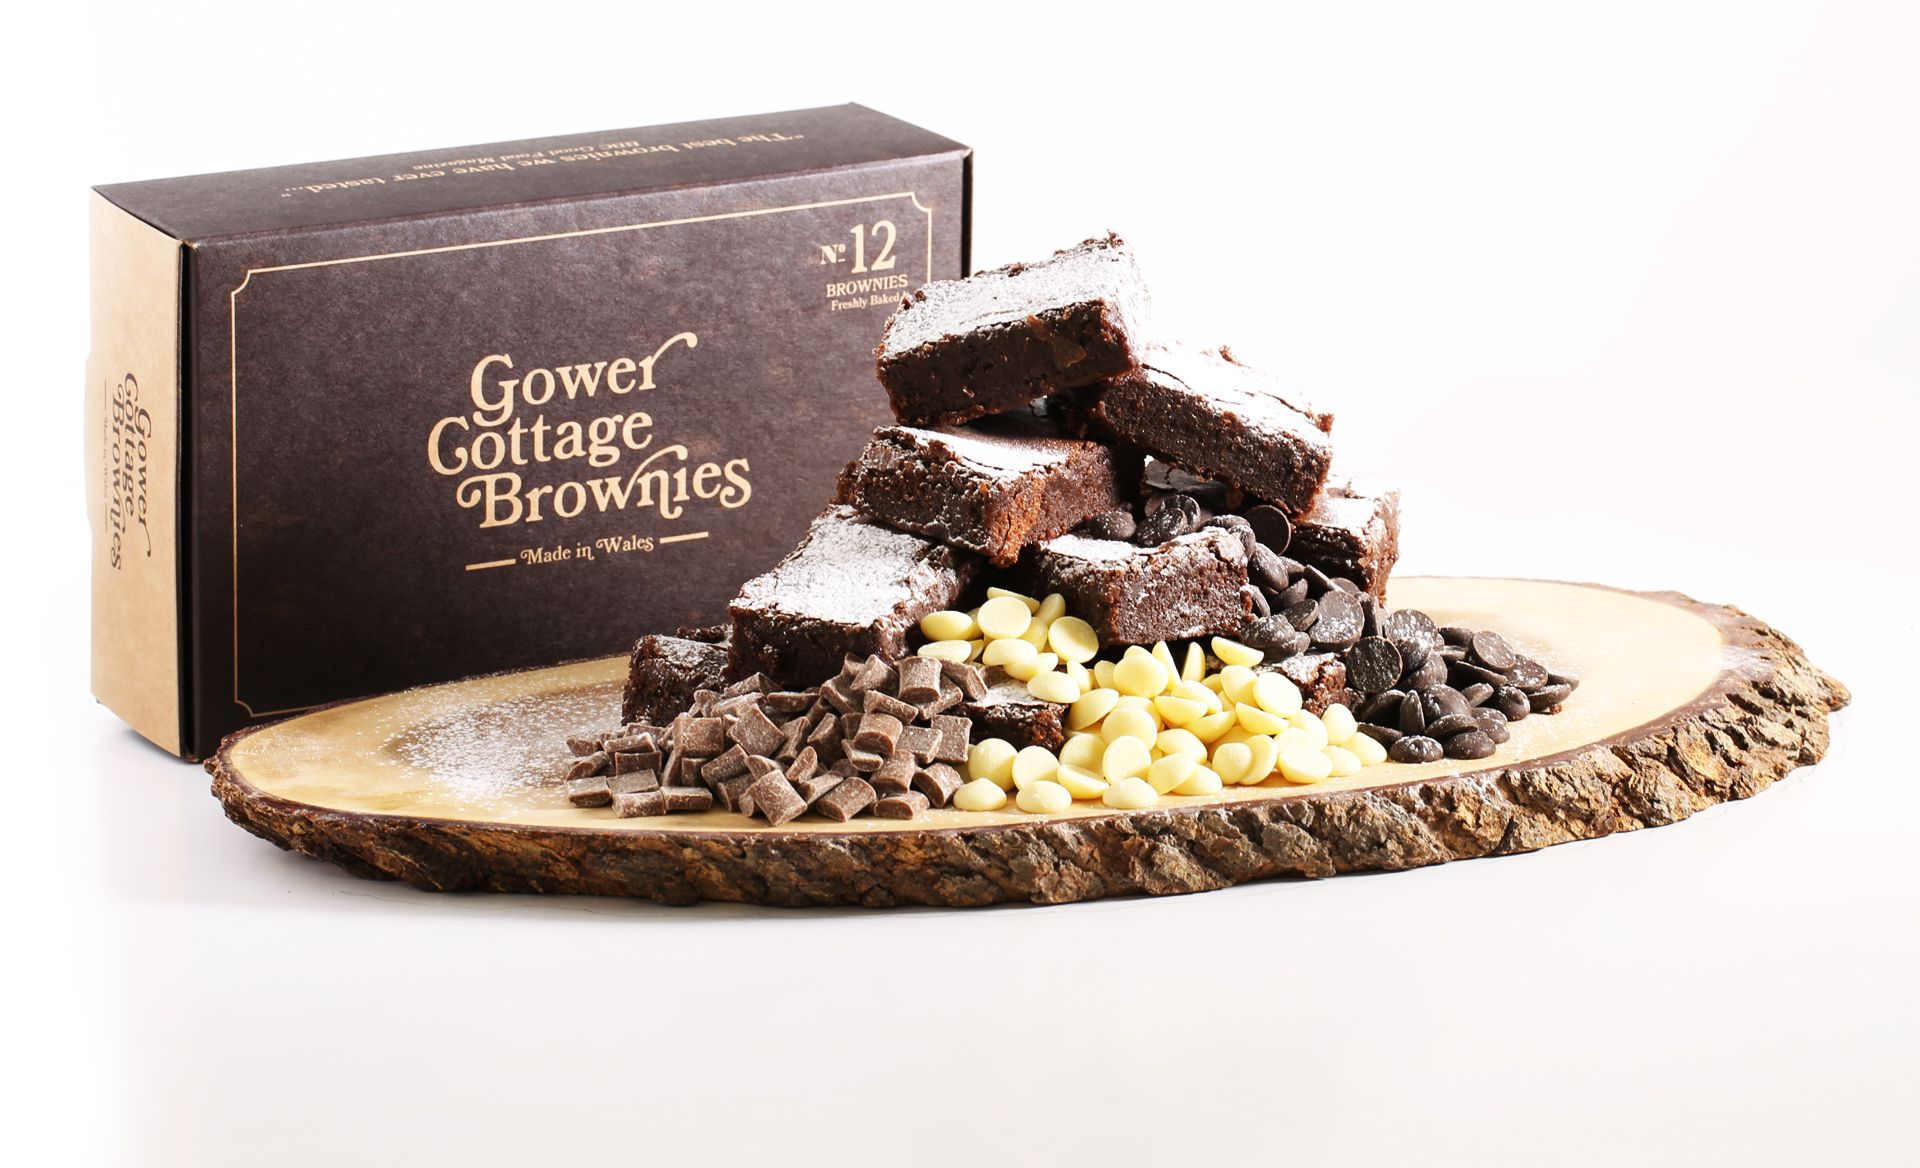 Triple Chocolate Gower Cottage Brownies